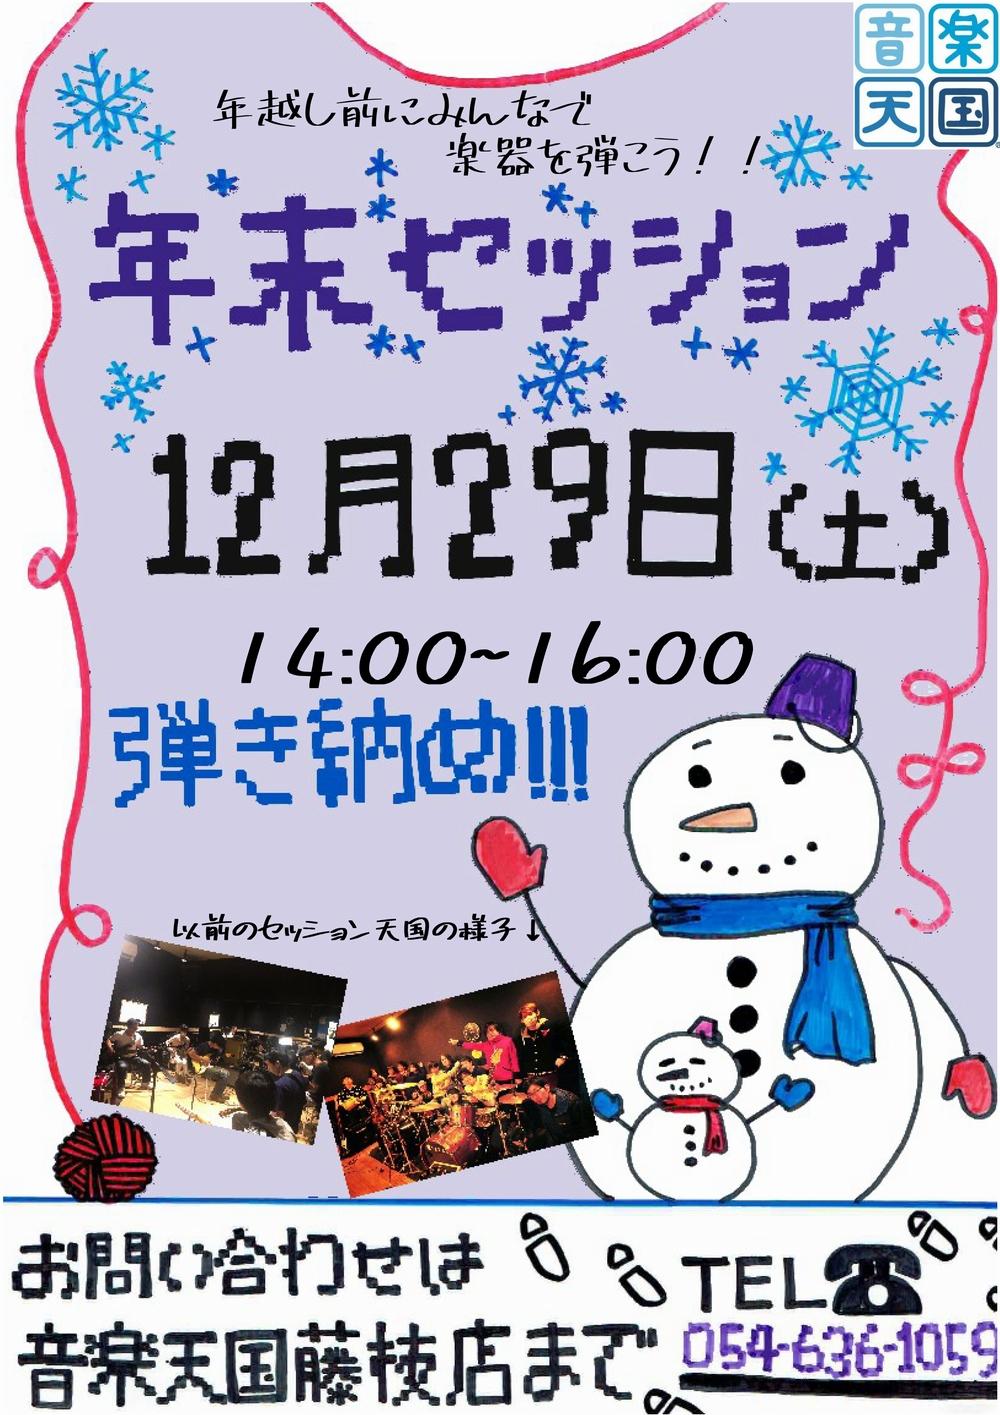 【年末セッション天国】音楽天国・藤枝店12月29日(土)開催